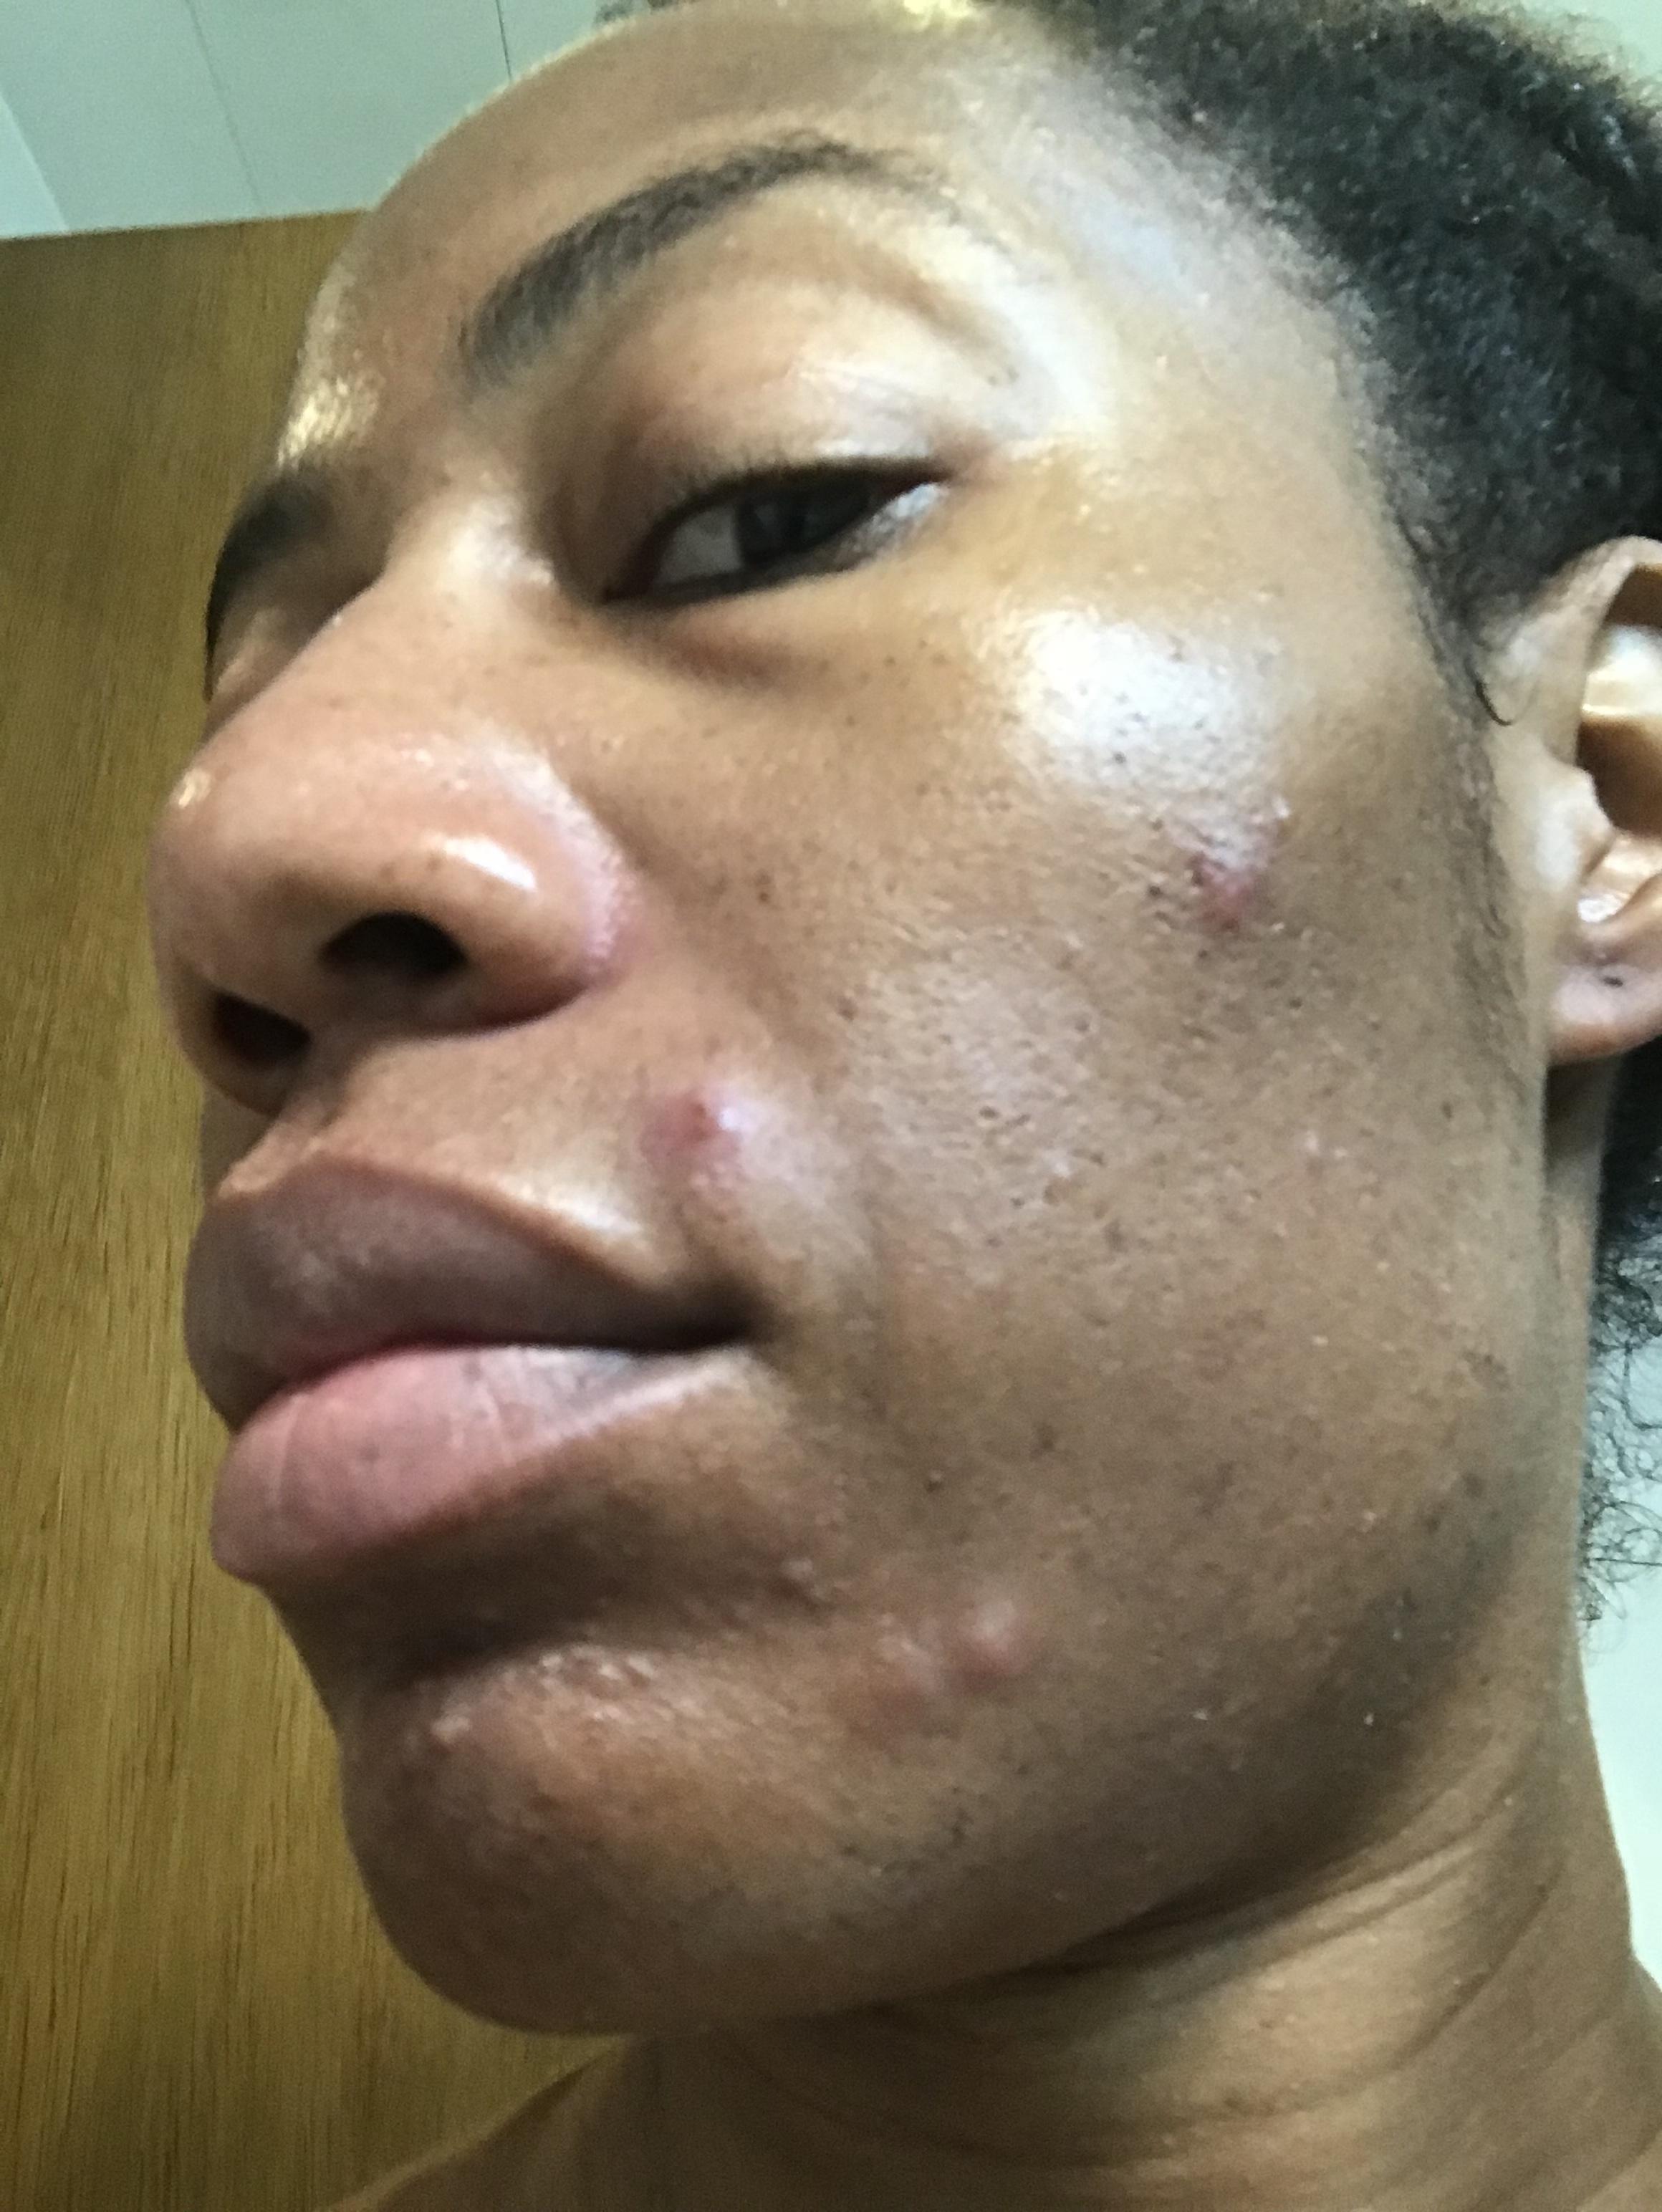 whole30 acne, whole30 cystic acne, whole 30 cystic acne